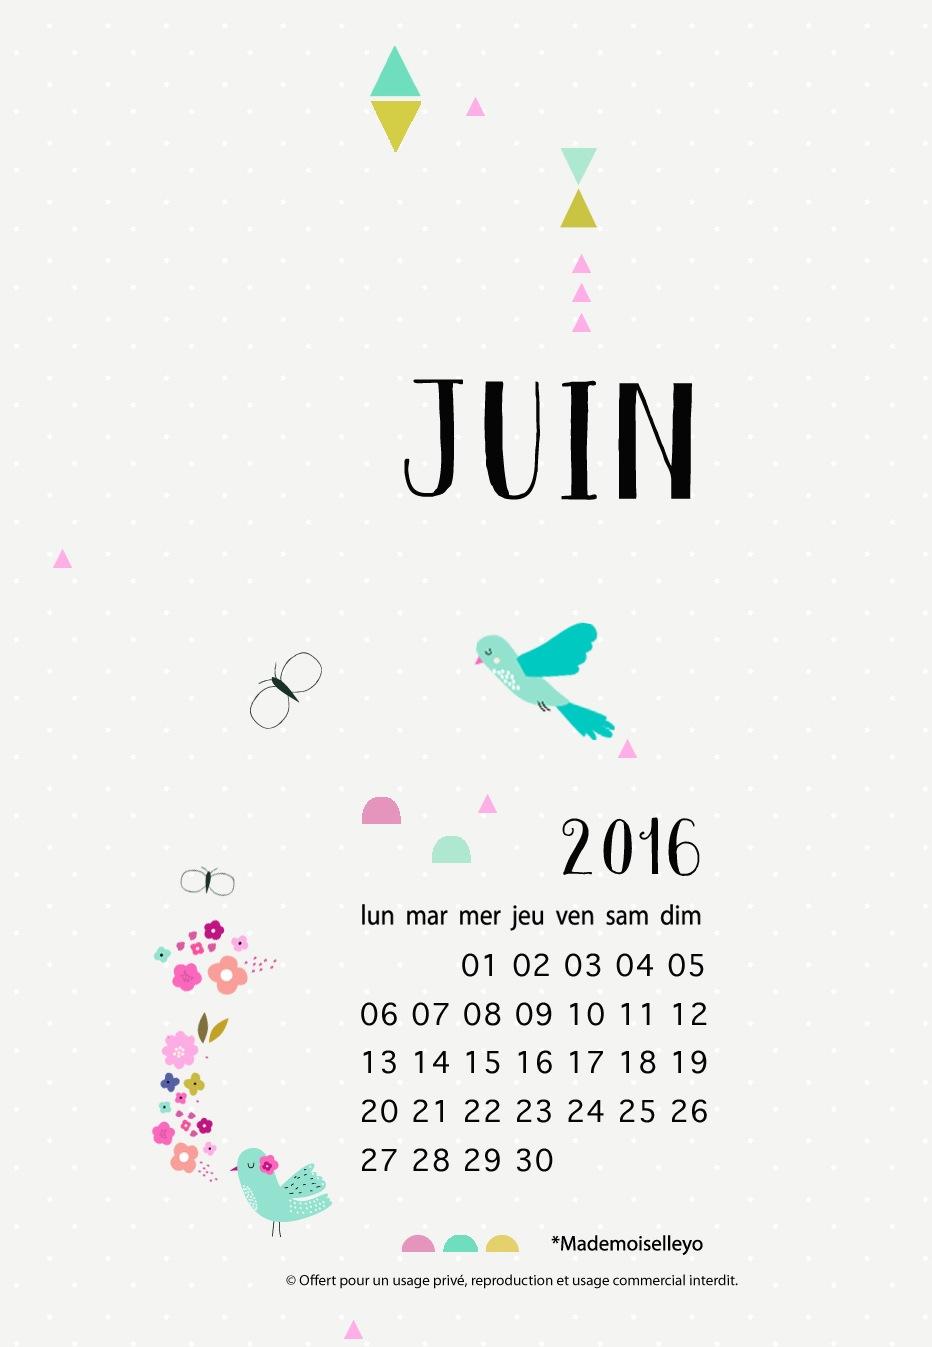 Mademoiselleyo fond d 39 cran juin - Calendrier du mois de juin 2017 ...